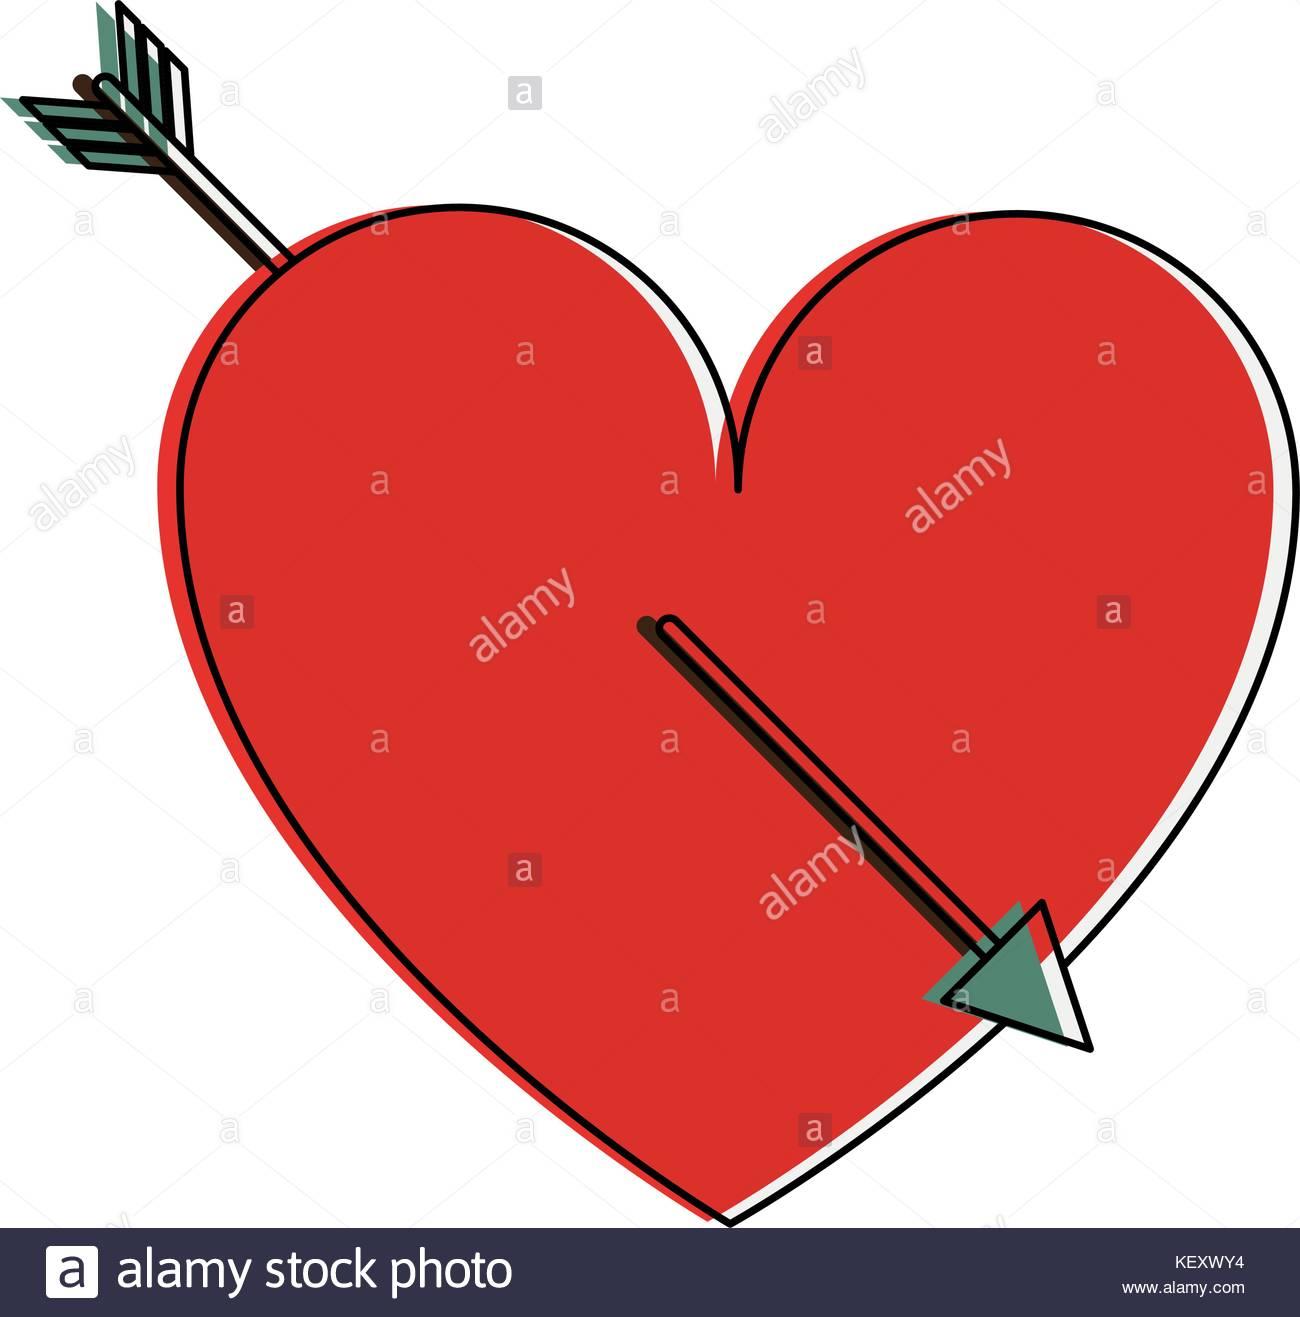 1300x1317 Heart With Arrow Stock Photos Amp Heart With Arrow Stock Images